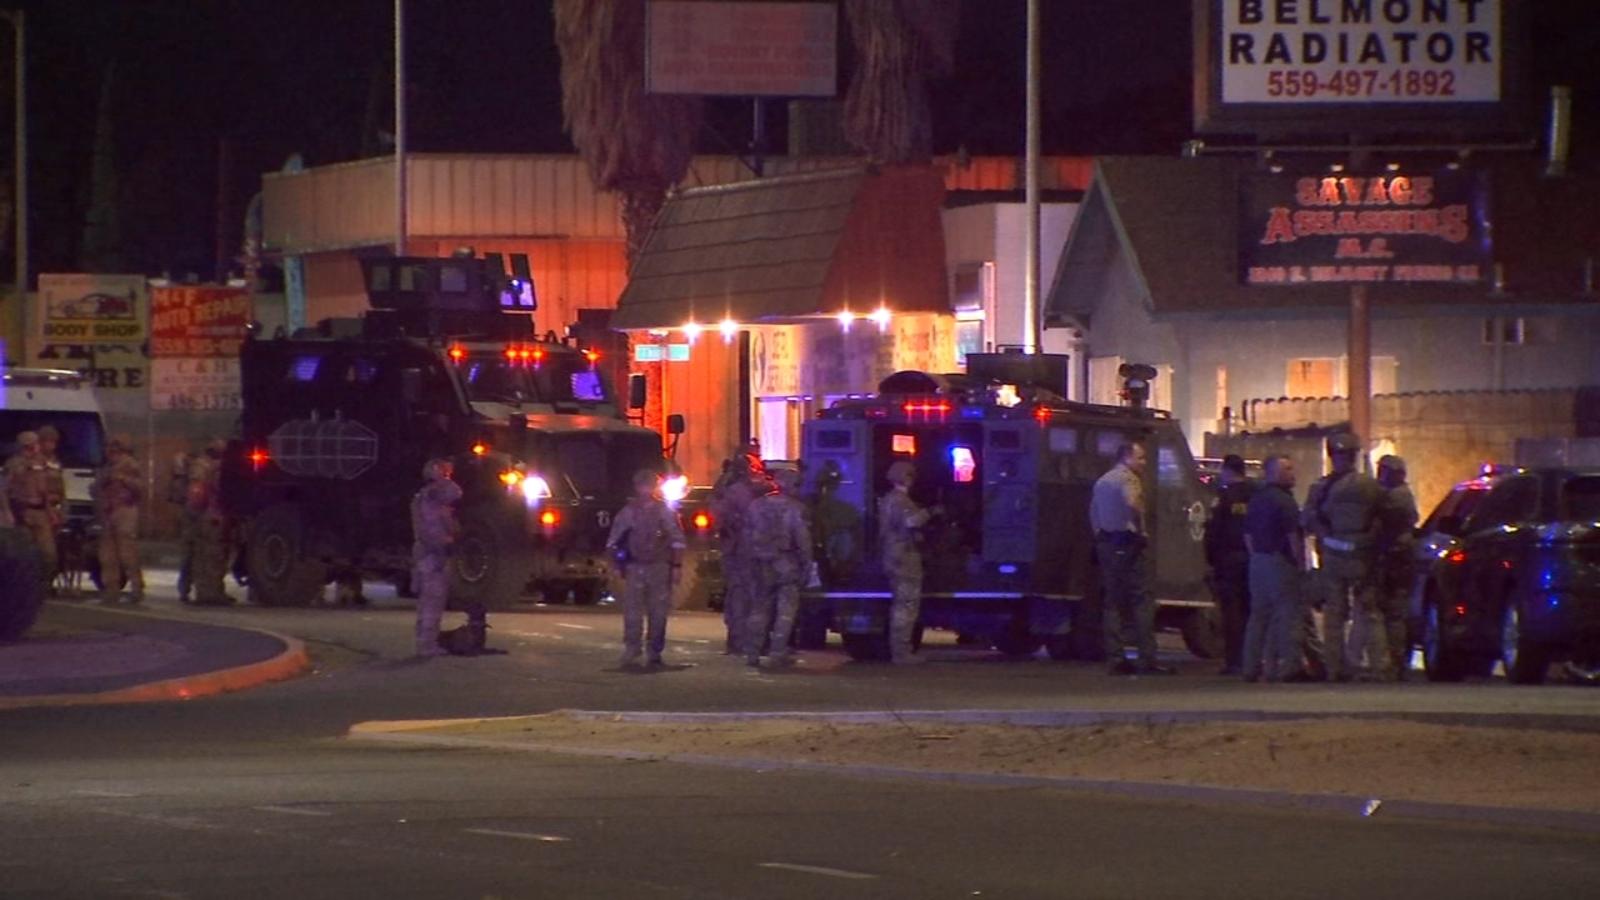 Sheriff's gang unit detains dozens, arrests 8 at central Fresno clubhouse